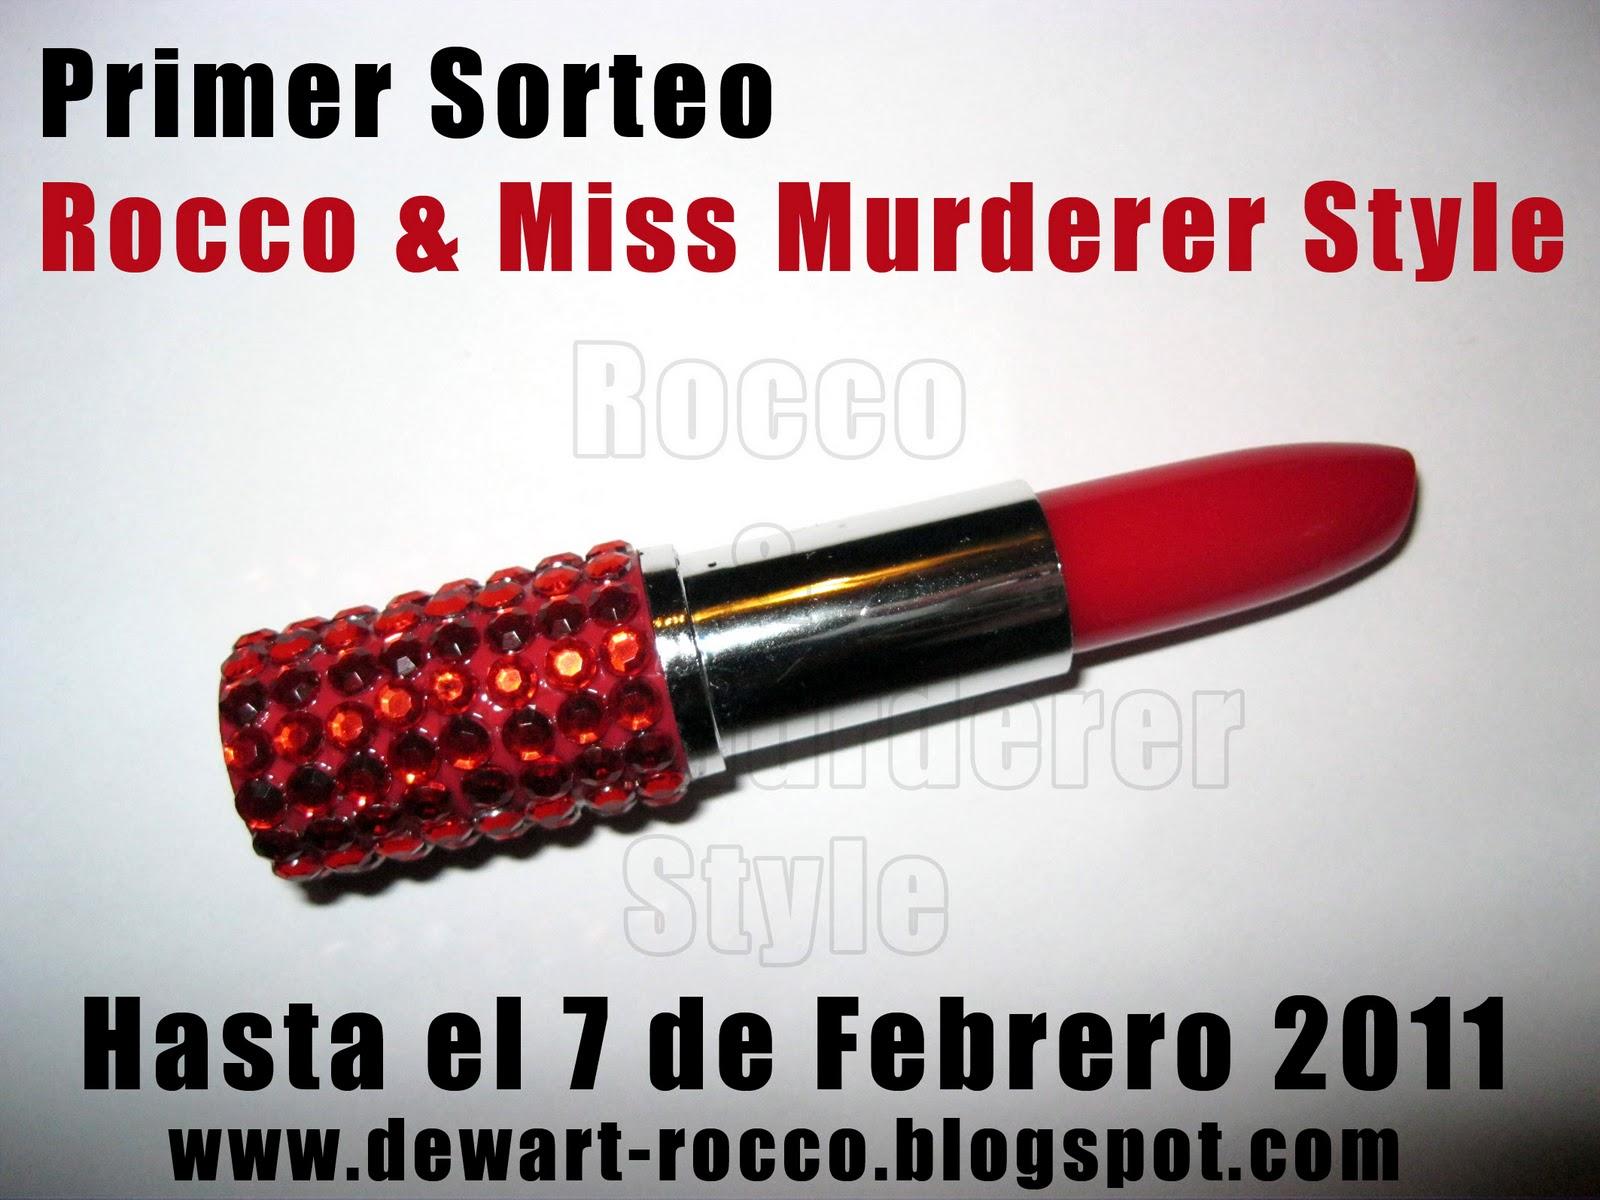 Rocco & Miss murderer style!!!